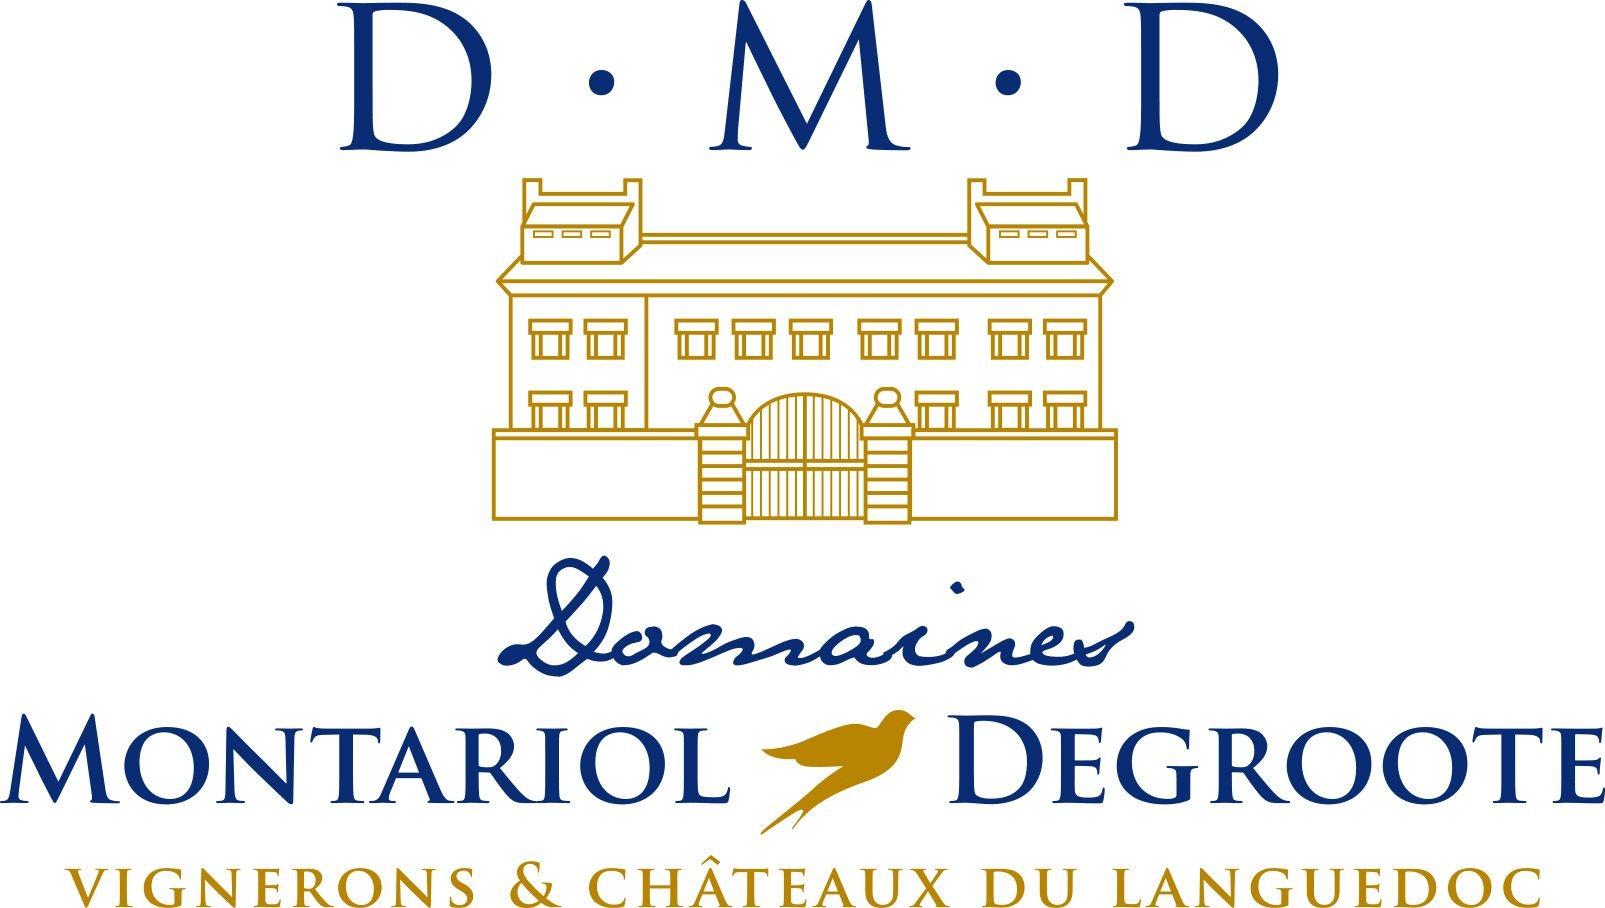 Domaine Montariol Degroote